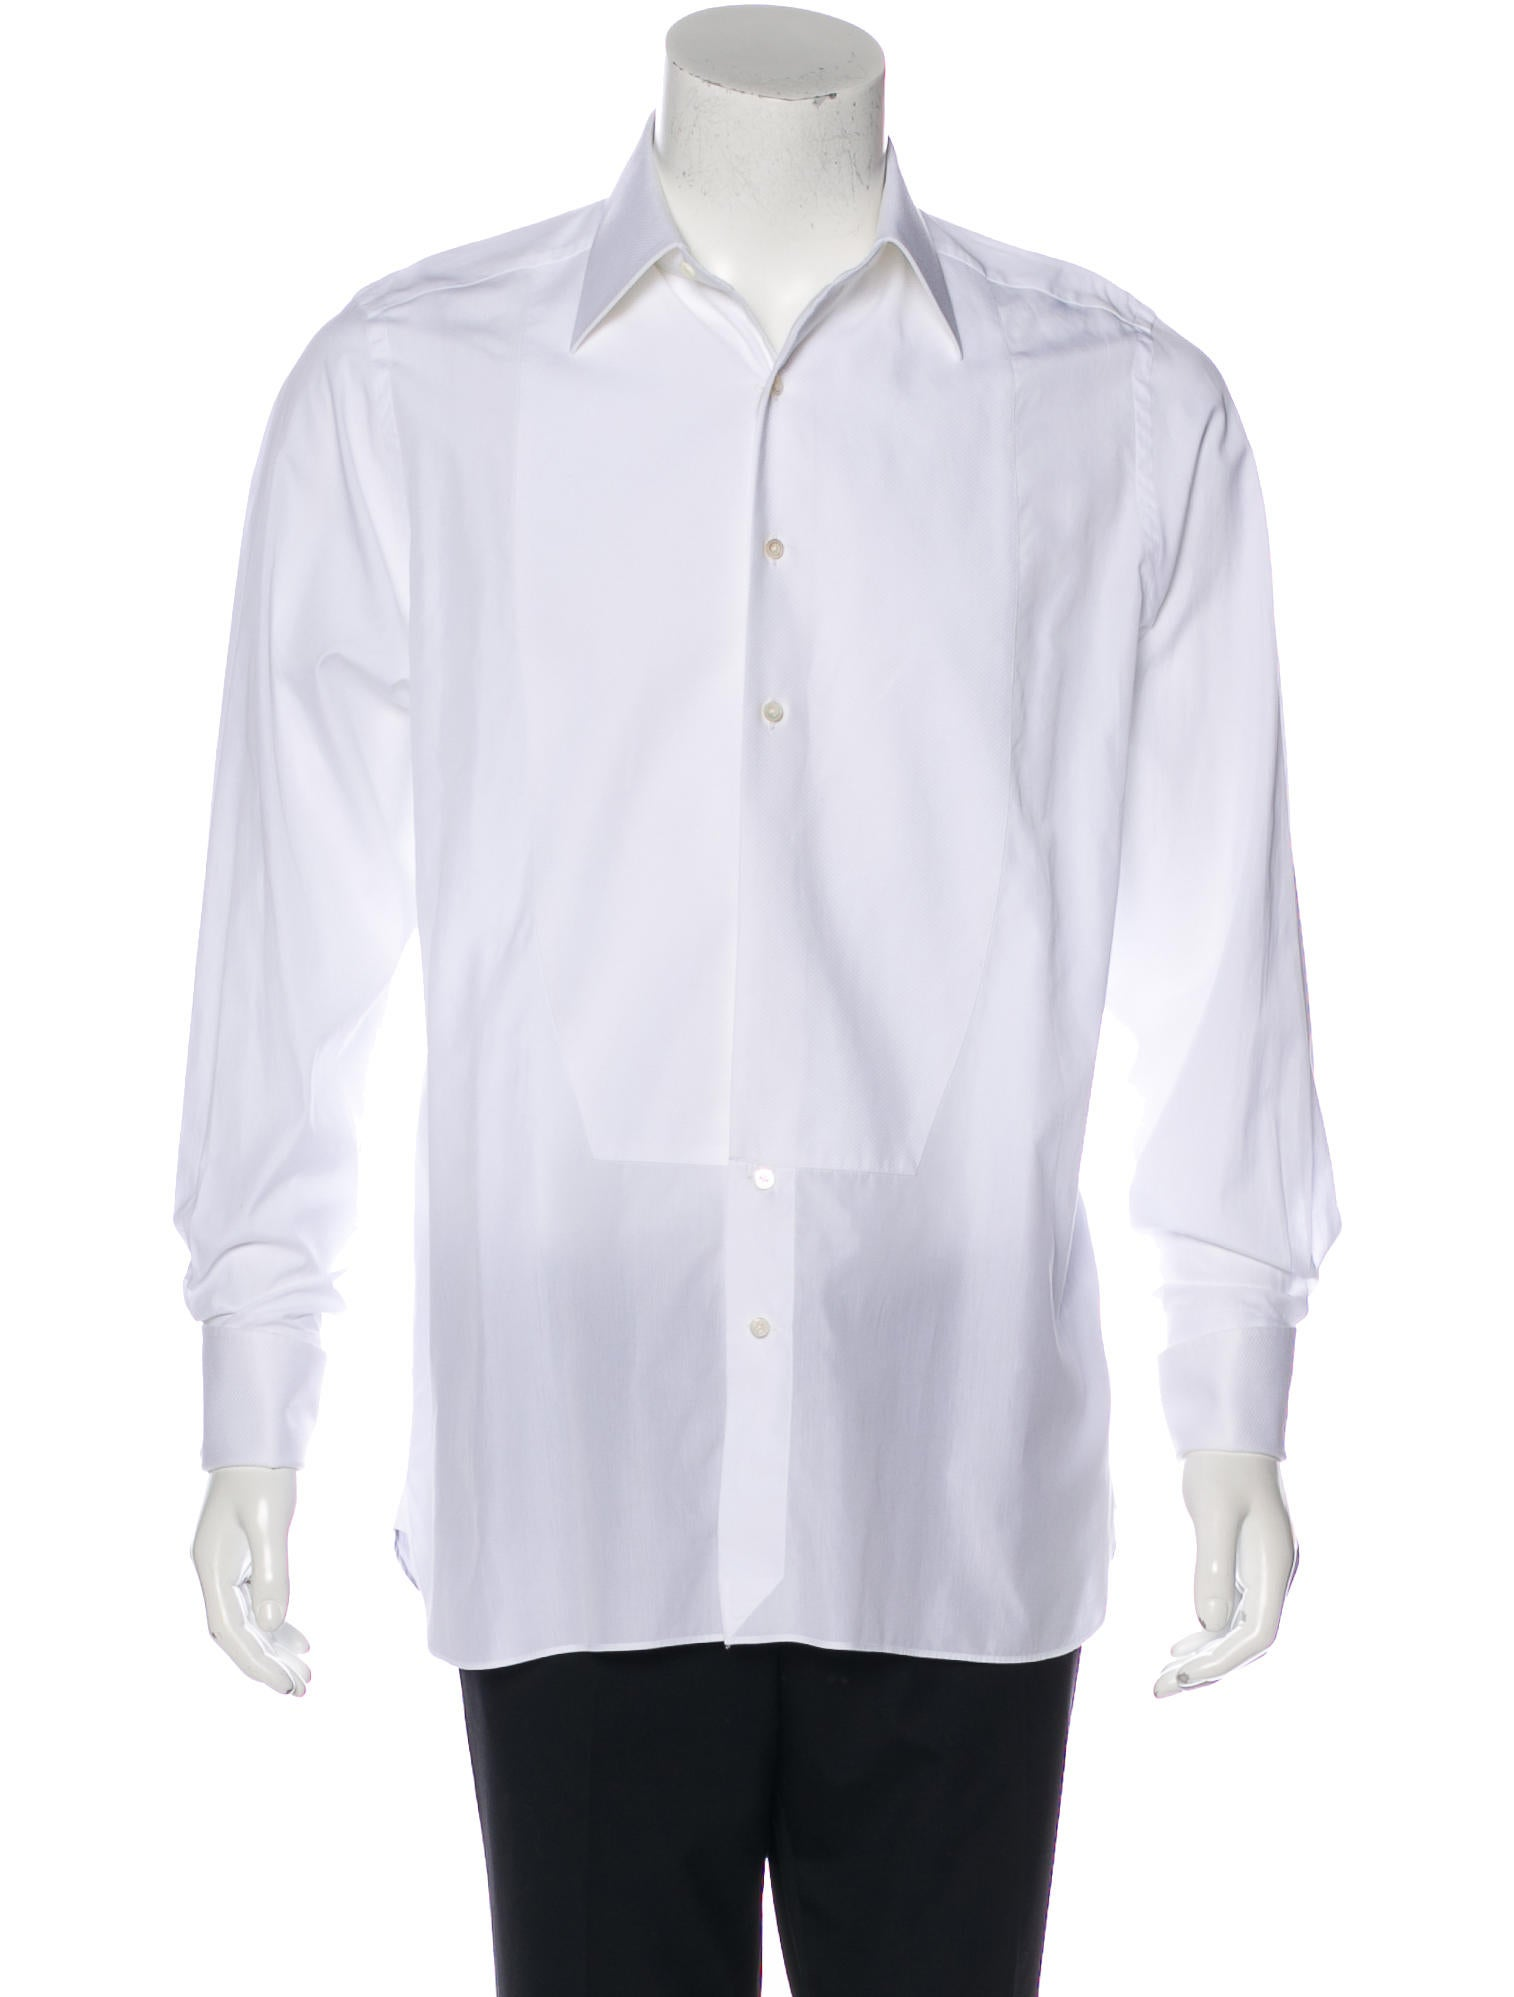 Tom ford tuxedo french cuff shirt clothing tom37626 for Tuxedo shirt french cuff